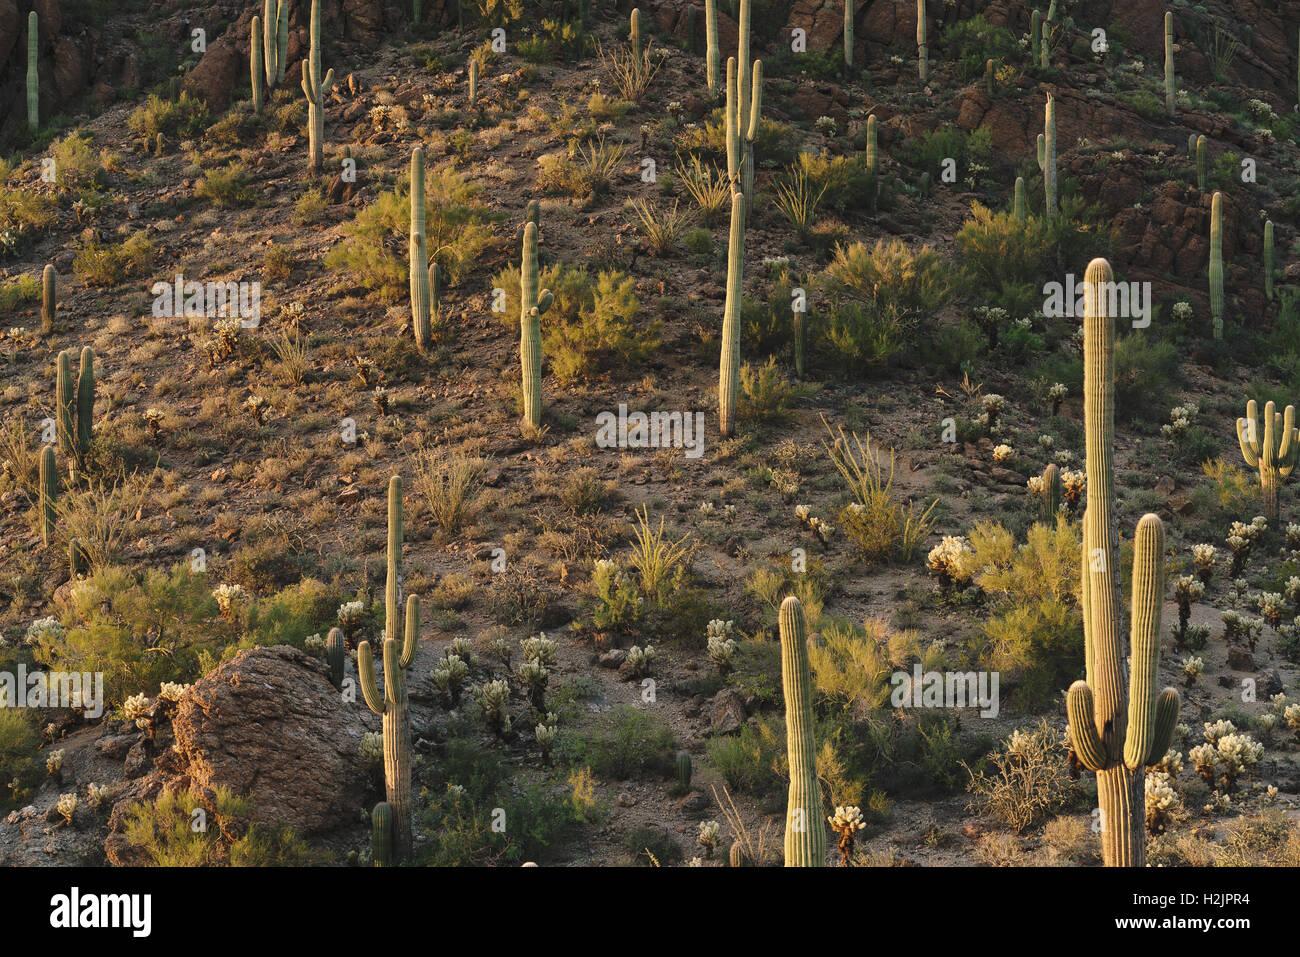 Saguaro cacti in Saguaro National Park, located near Tuscon, Arizona. - Stock Image